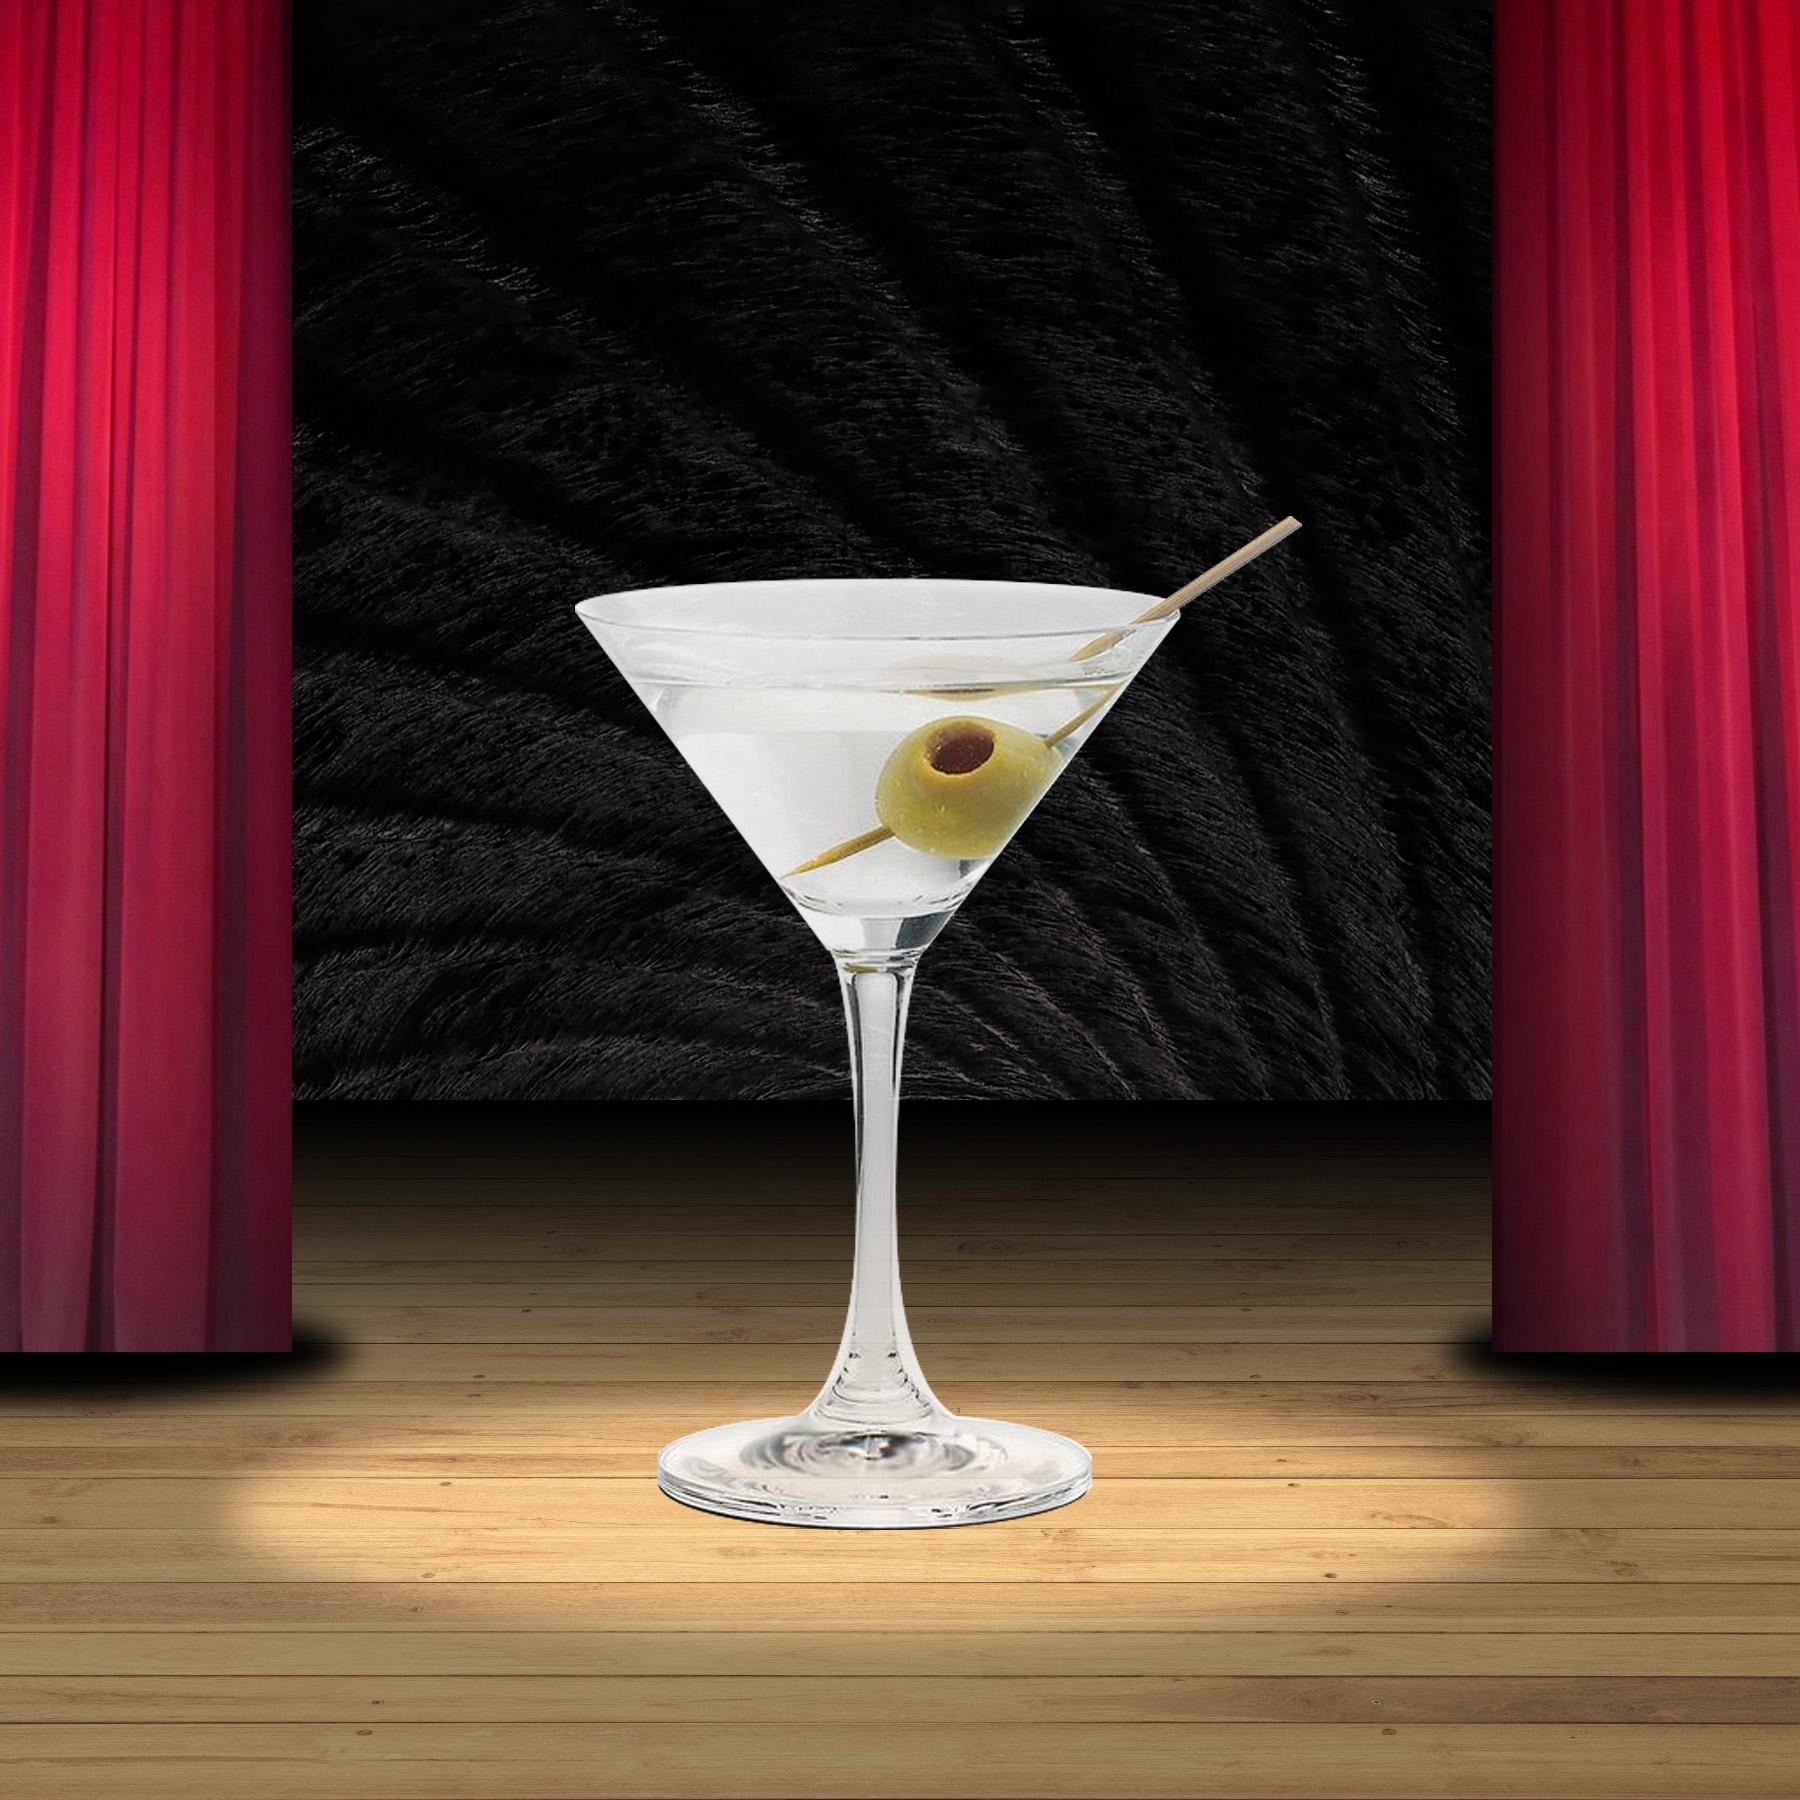 This Martini Was Fucking Dreadful sayeth Keegan